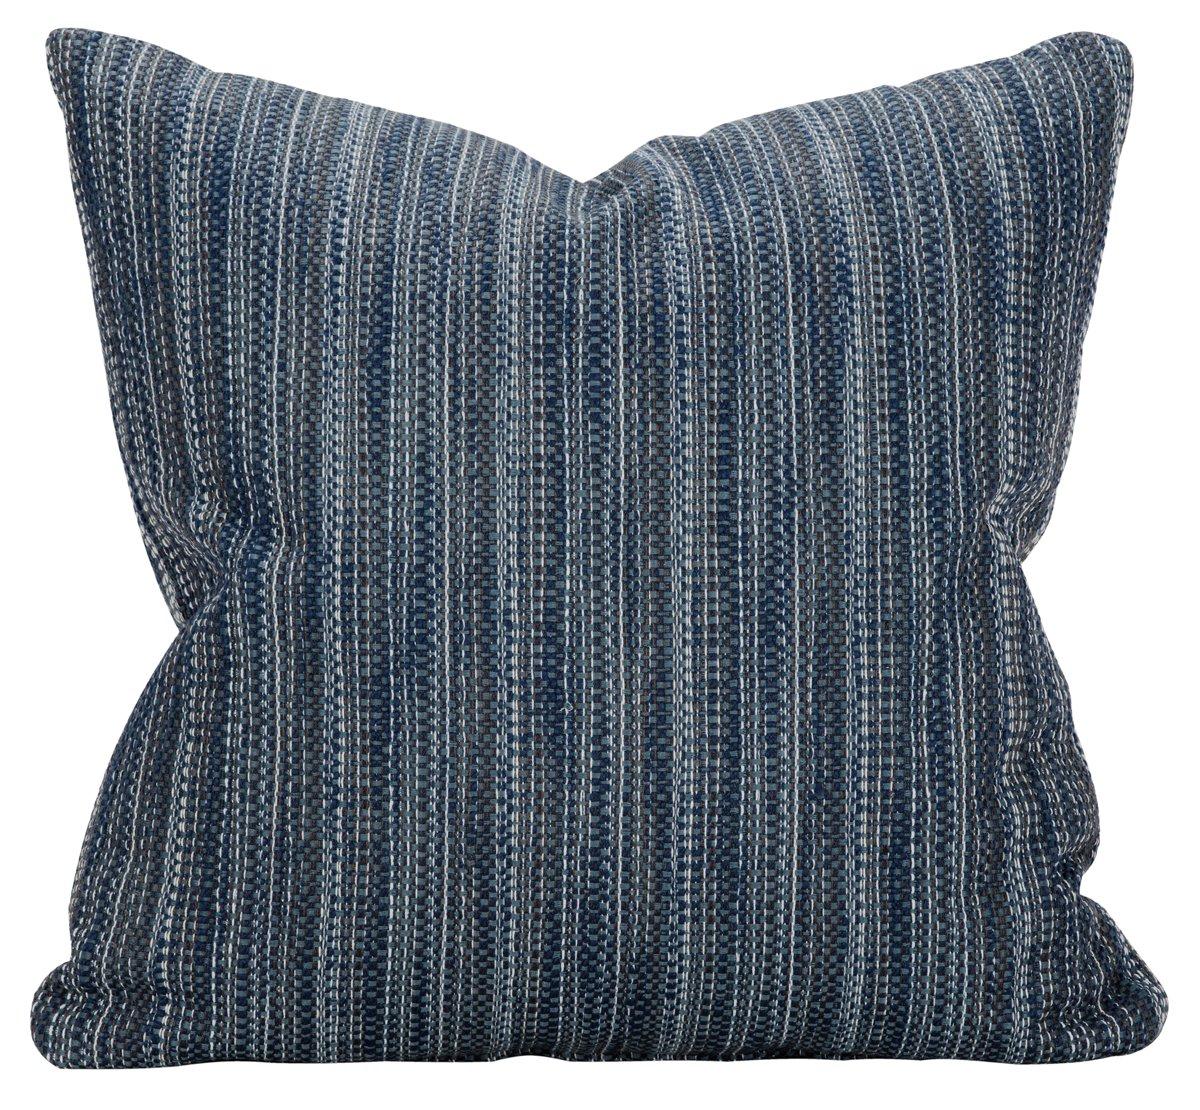 Brisbane Dark Blue Fabric Square Accent Pillow